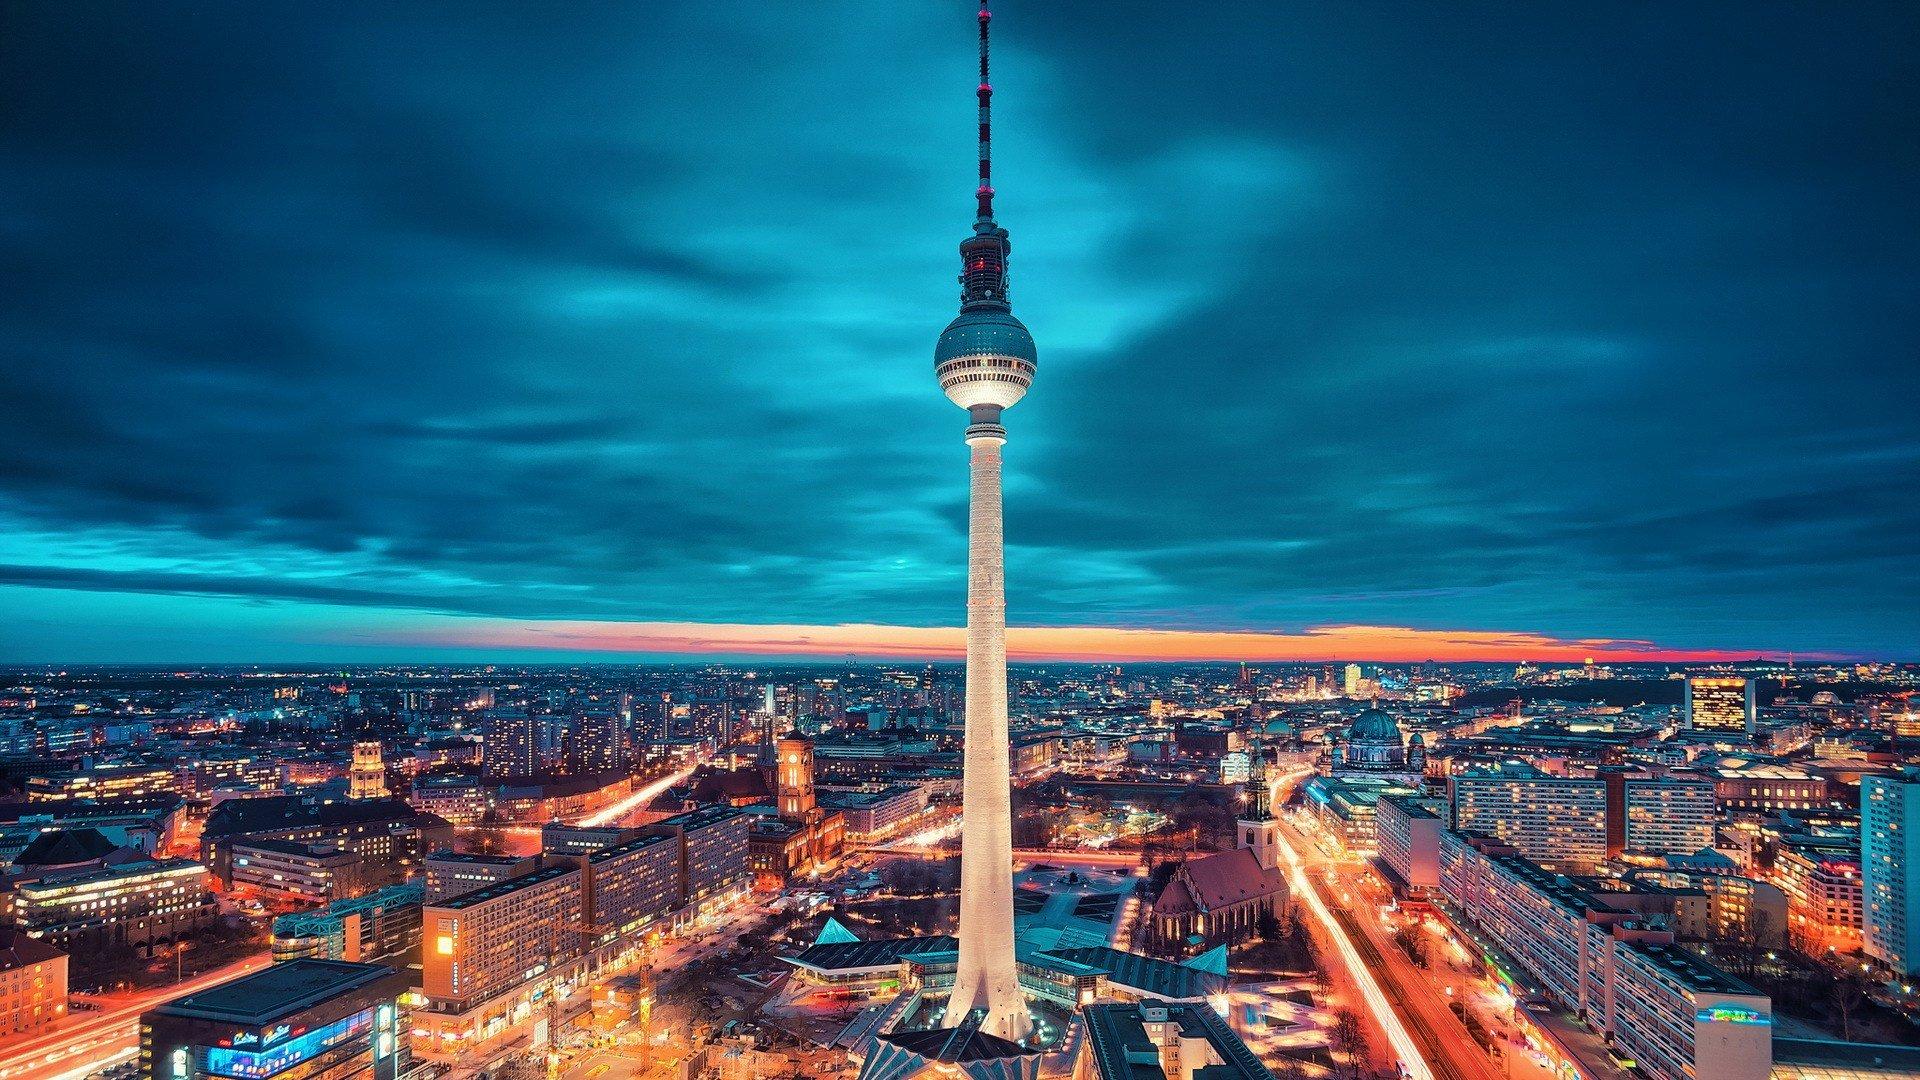 Berlin Full HD Wallpaper